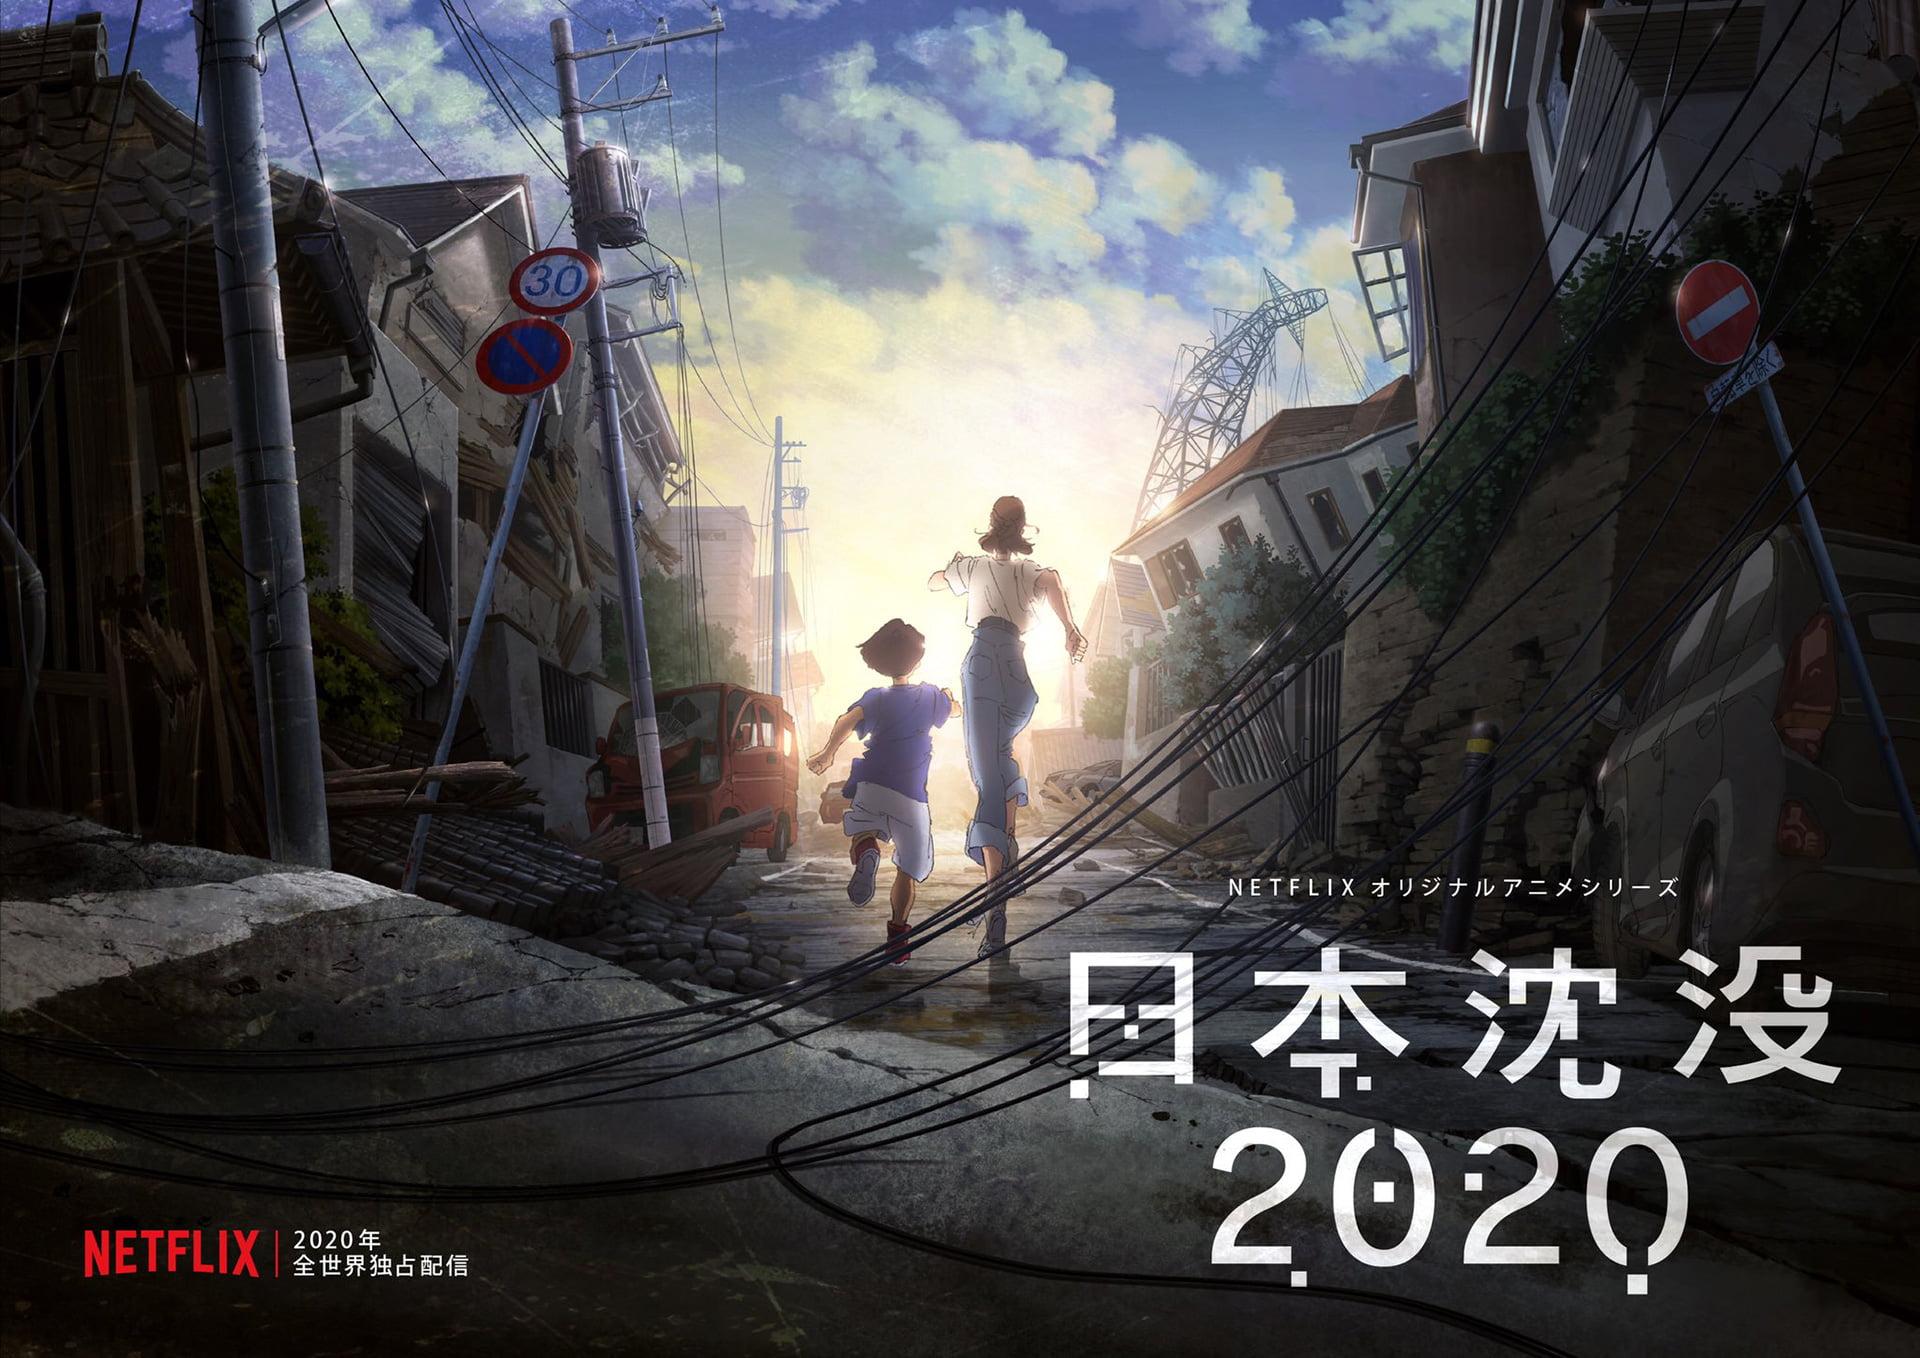 Japan Sinks 2020 ญี่ปุ่นวิปโยค